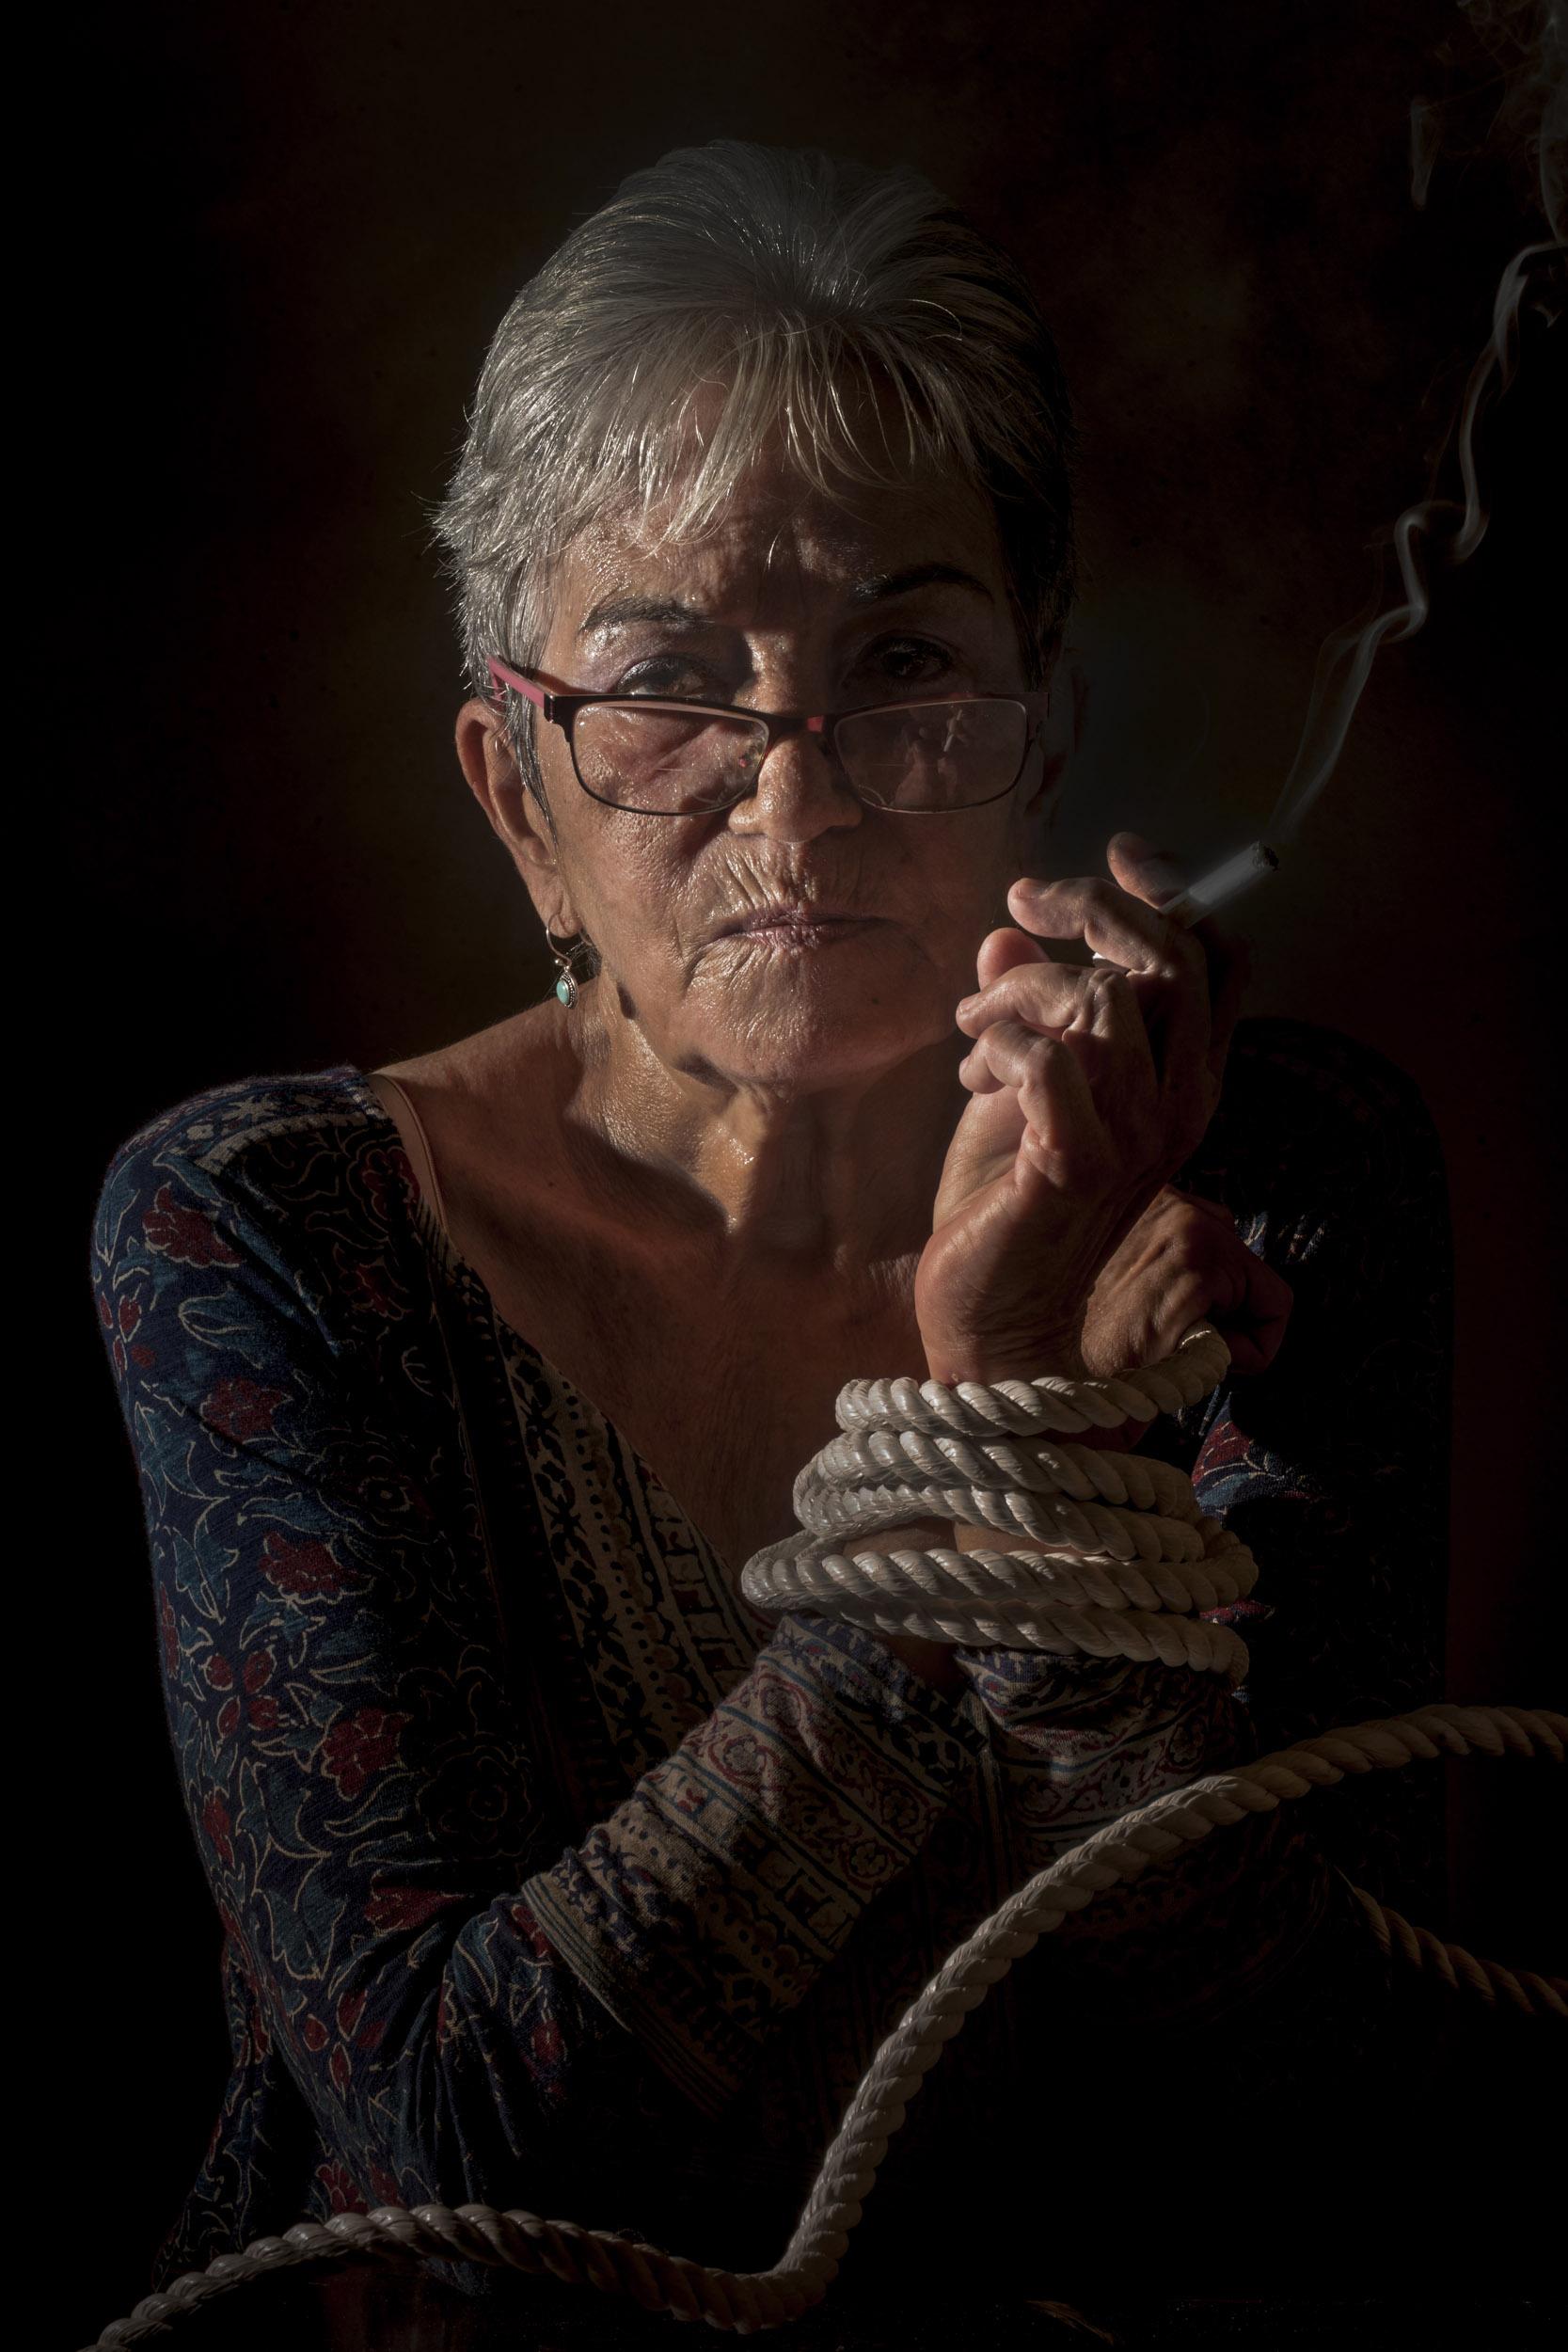 Luisa María Serrano (Lichi), painter - Illuminated Cuba - Hector Garrido, Aerial and human photography